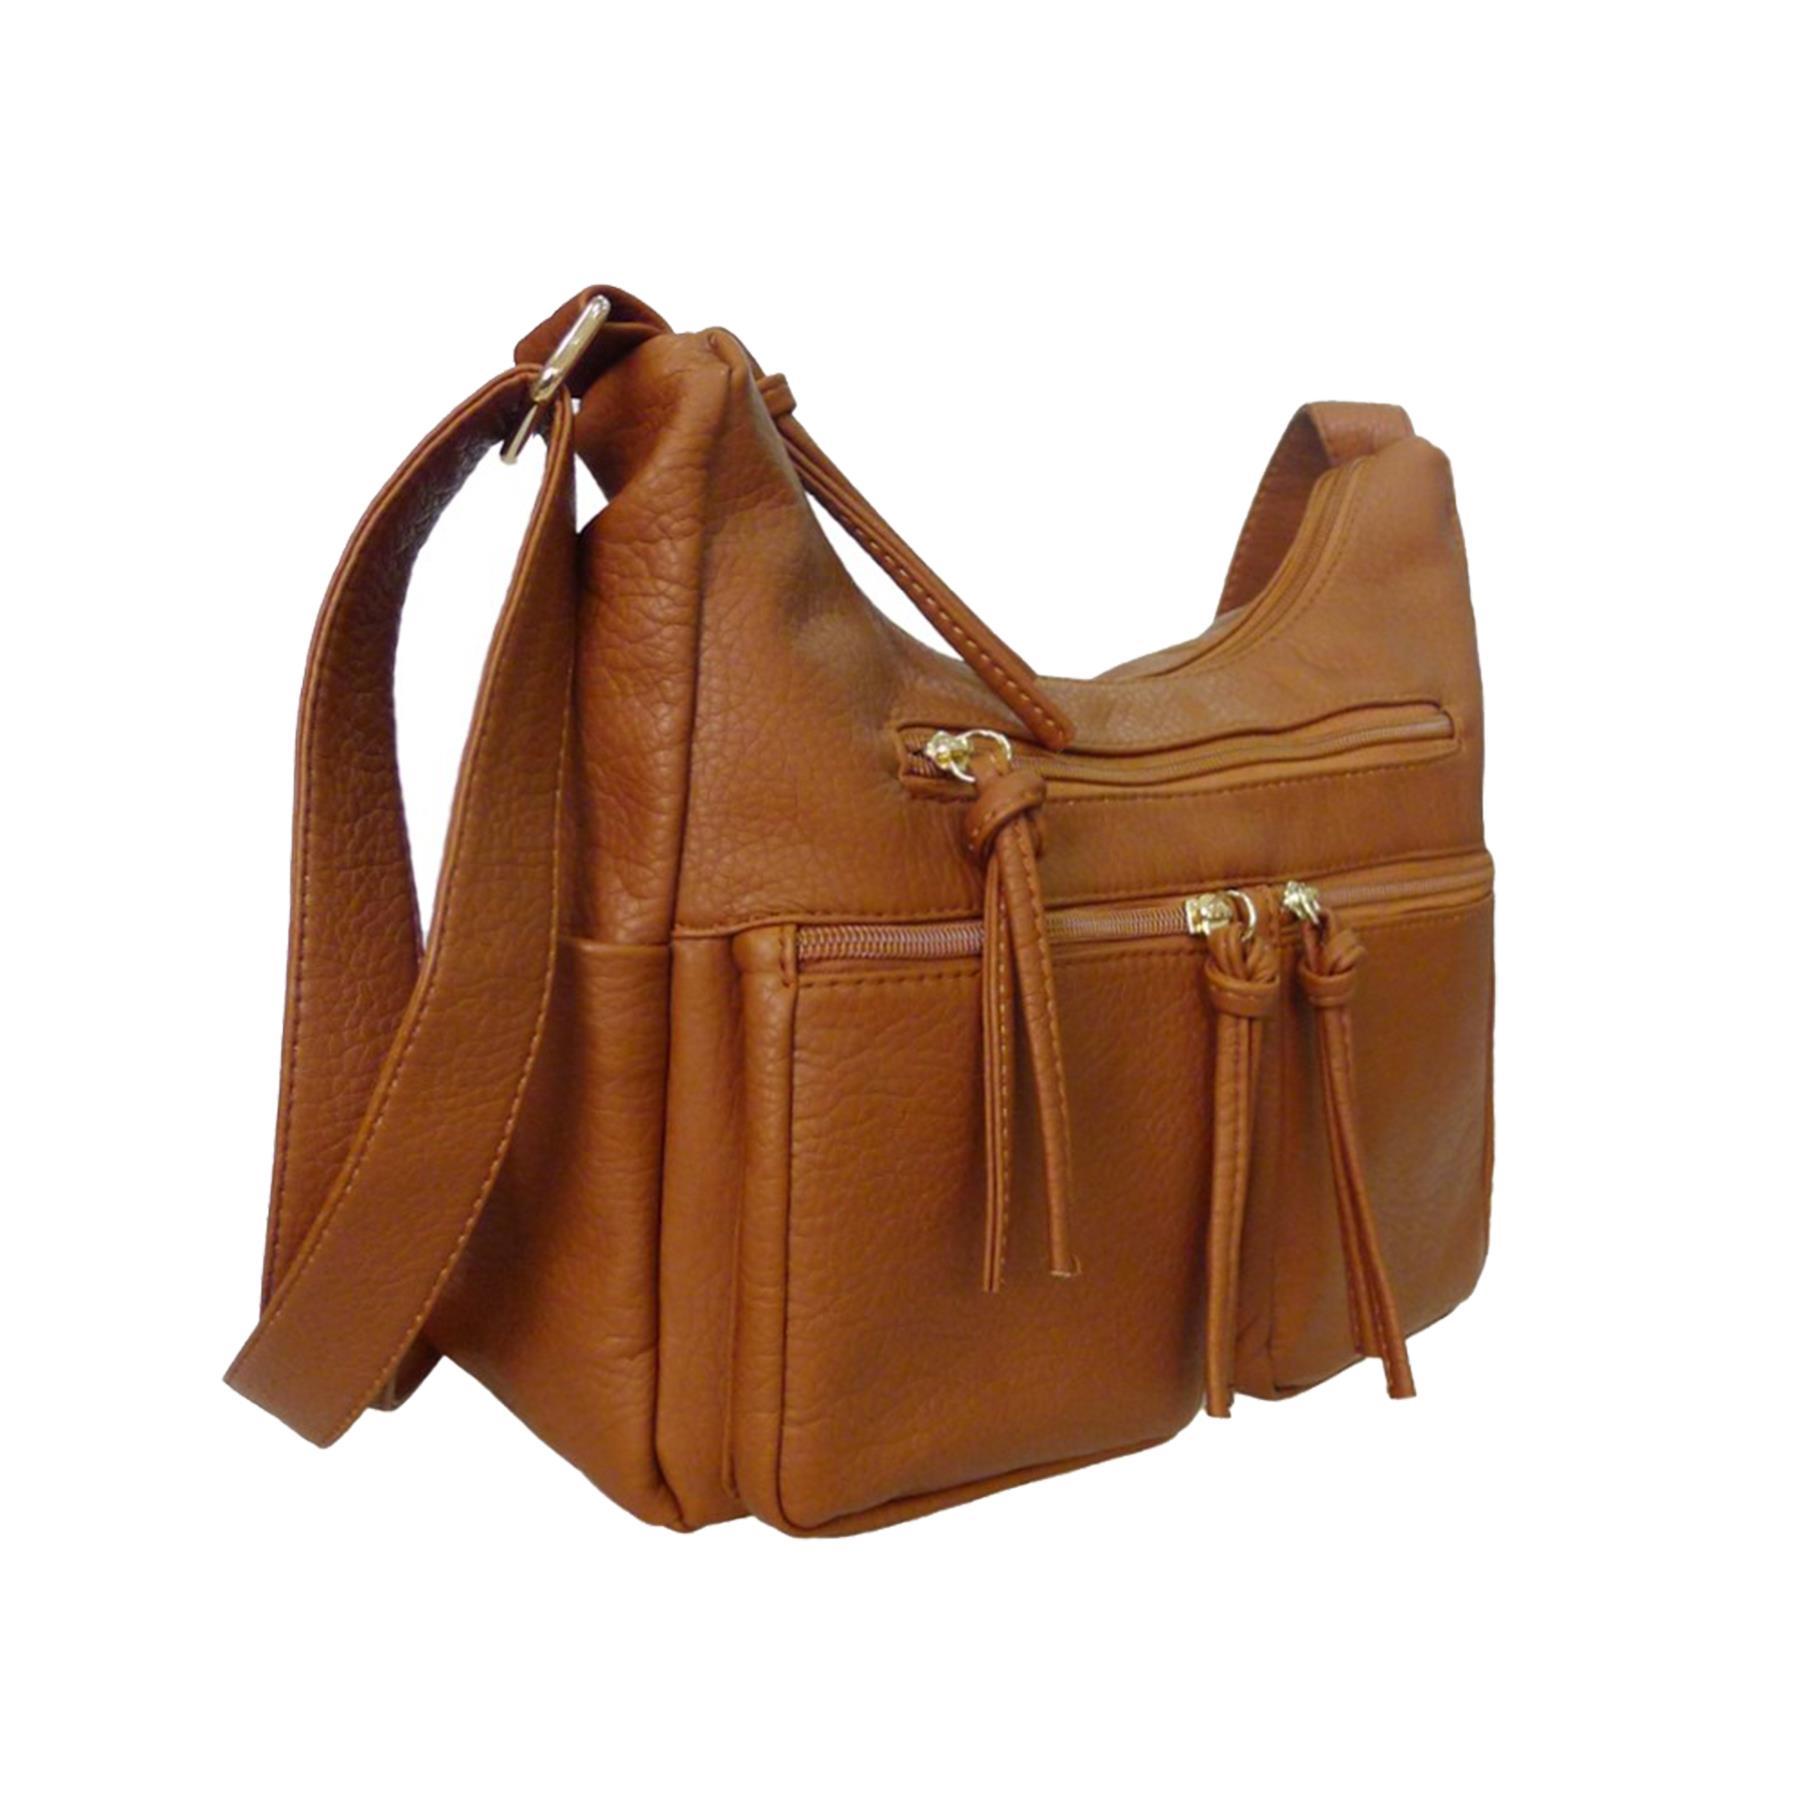 New-Unisex-Synthetic-Leather-Zip-Tassels-Multiple-Pockets-Cross-Body-Bag thumbnail 3